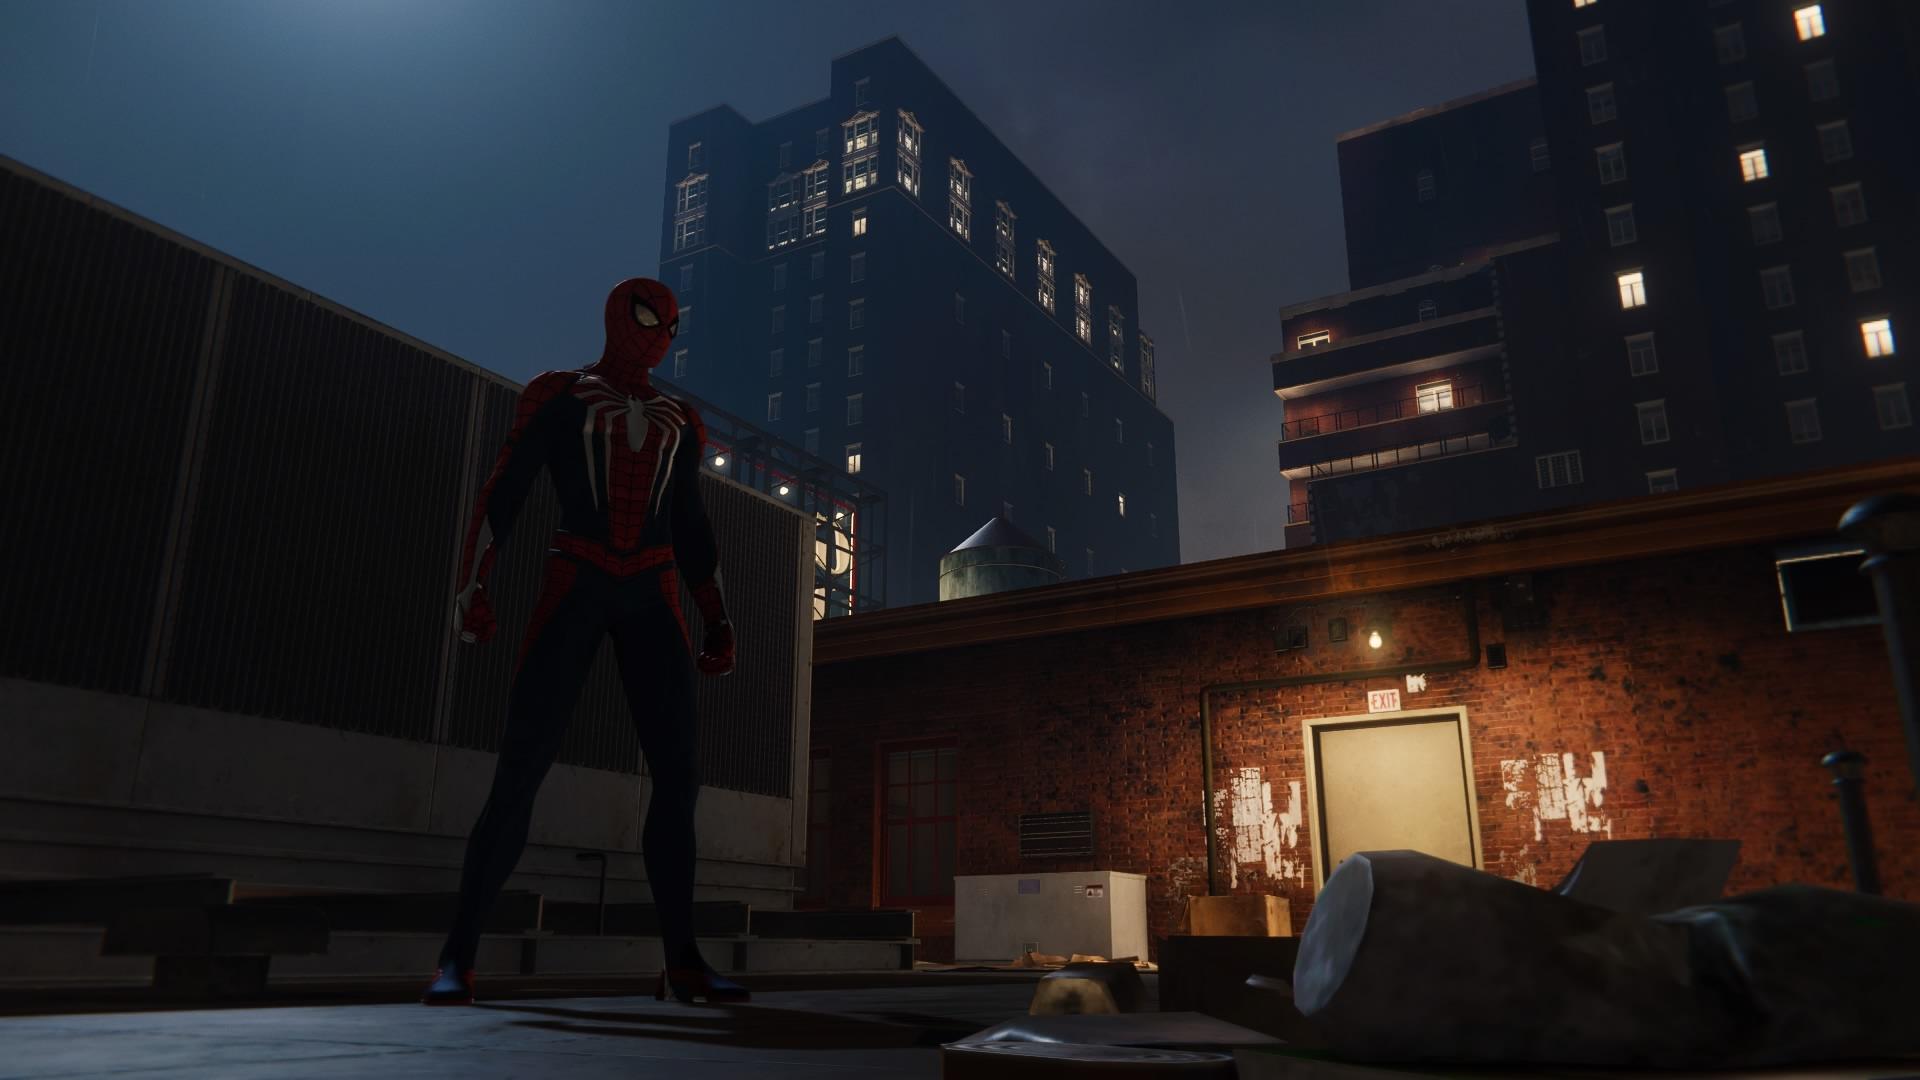 8fae78ba50fba082bd59d7ab9840092c.jpg - Marvel's Spider-Man